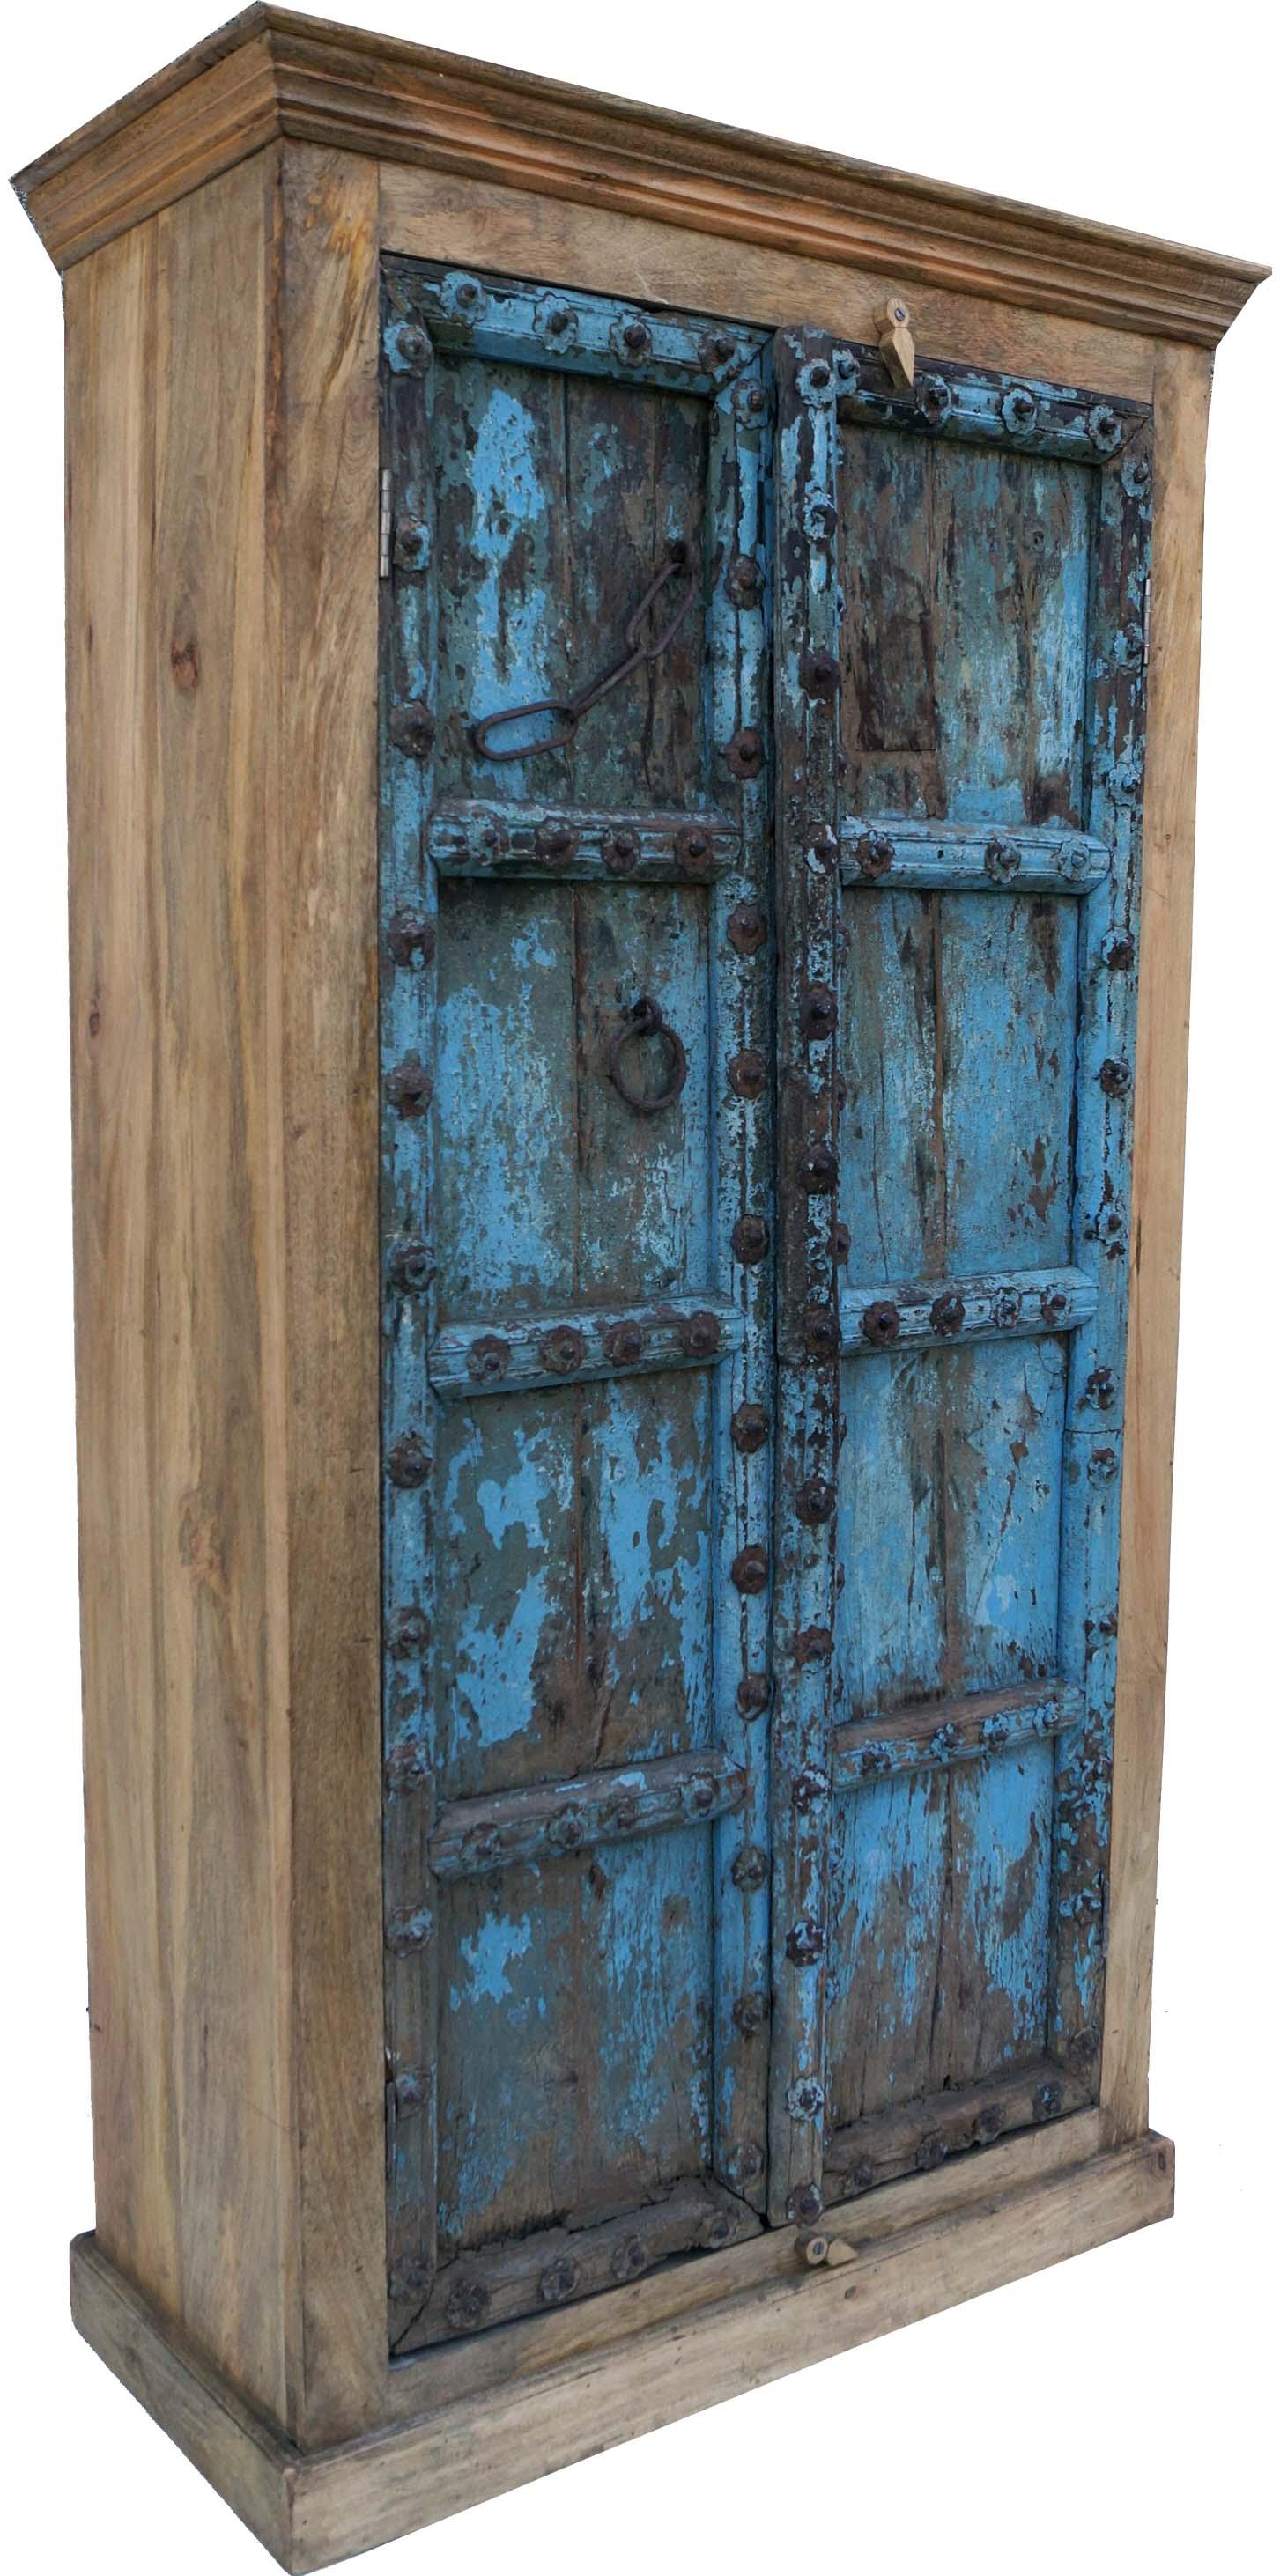 schrank kleiderschrank massivholz kolonialstil indien 188x100x45 cm. Black Bedroom Furniture Sets. Home Design Ideas